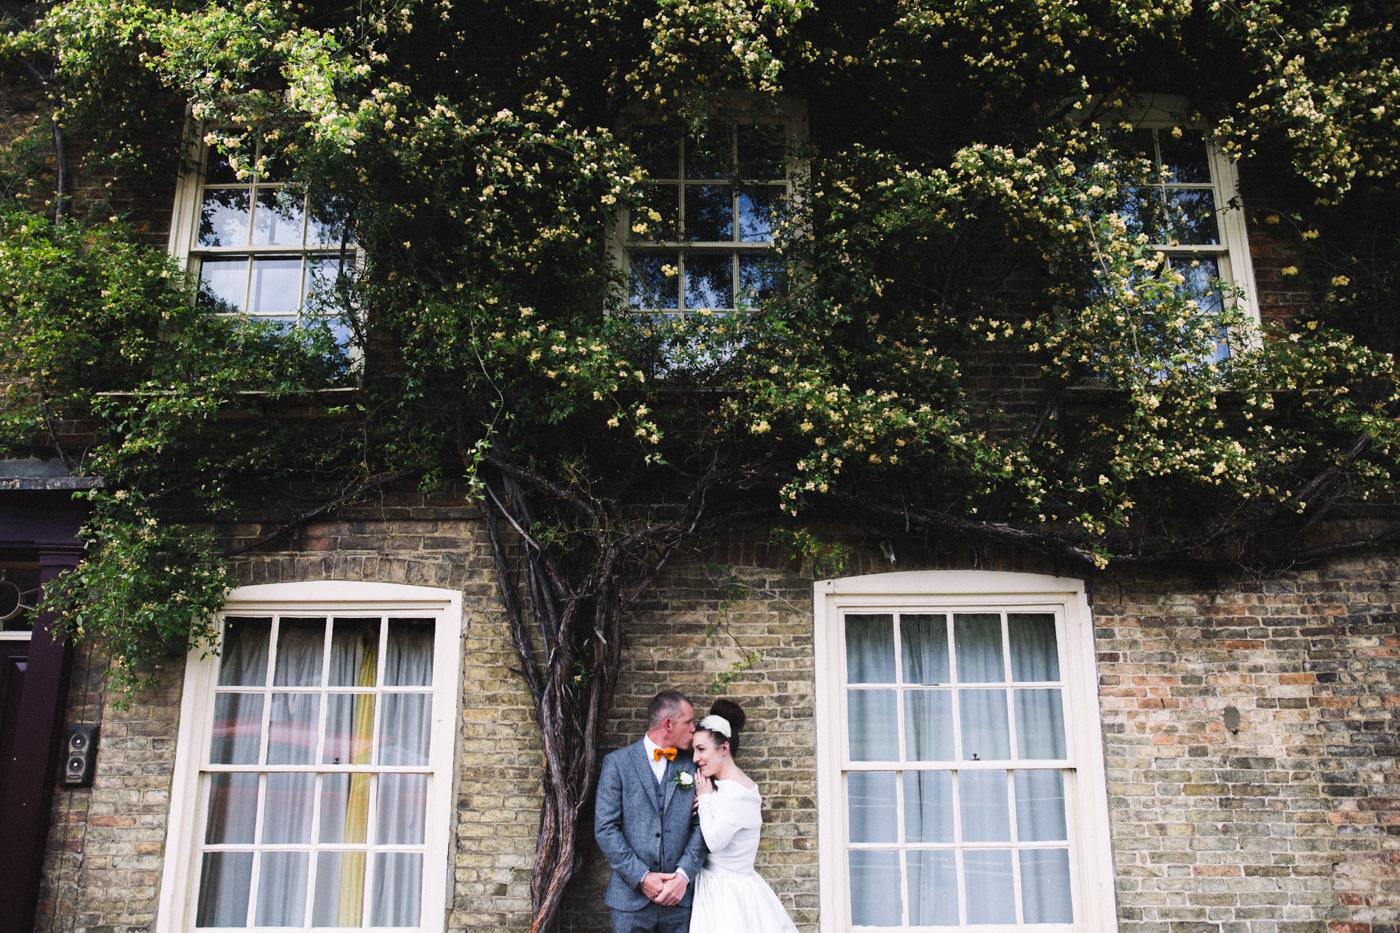 teesside-middlesbrough-north-east-wedding-photographer-creative-wedding-venues-0016.jpg